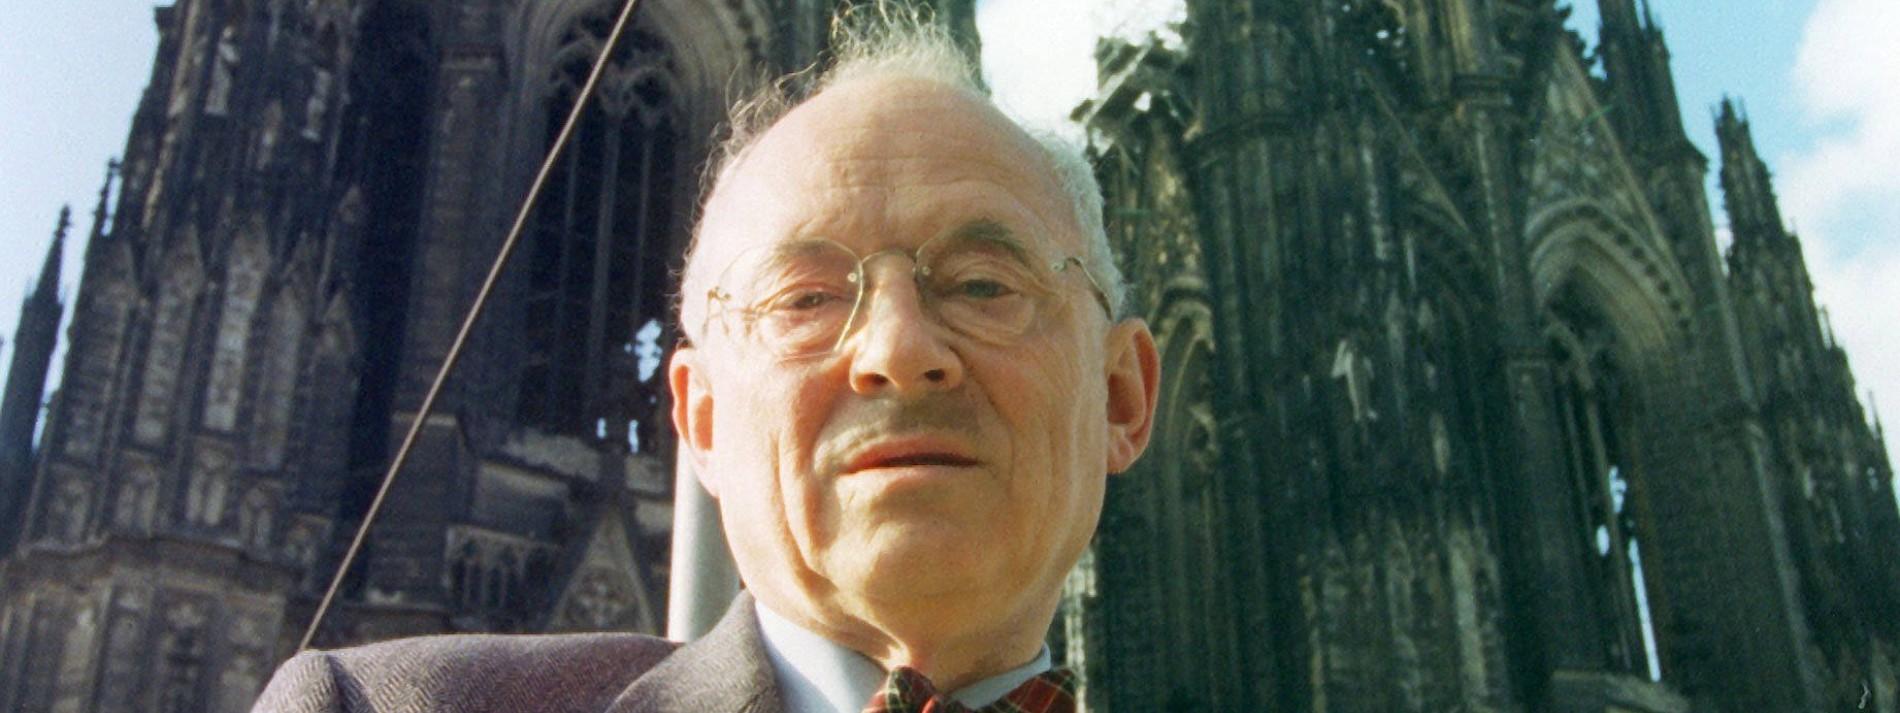 Kölns erster Diener des Doms